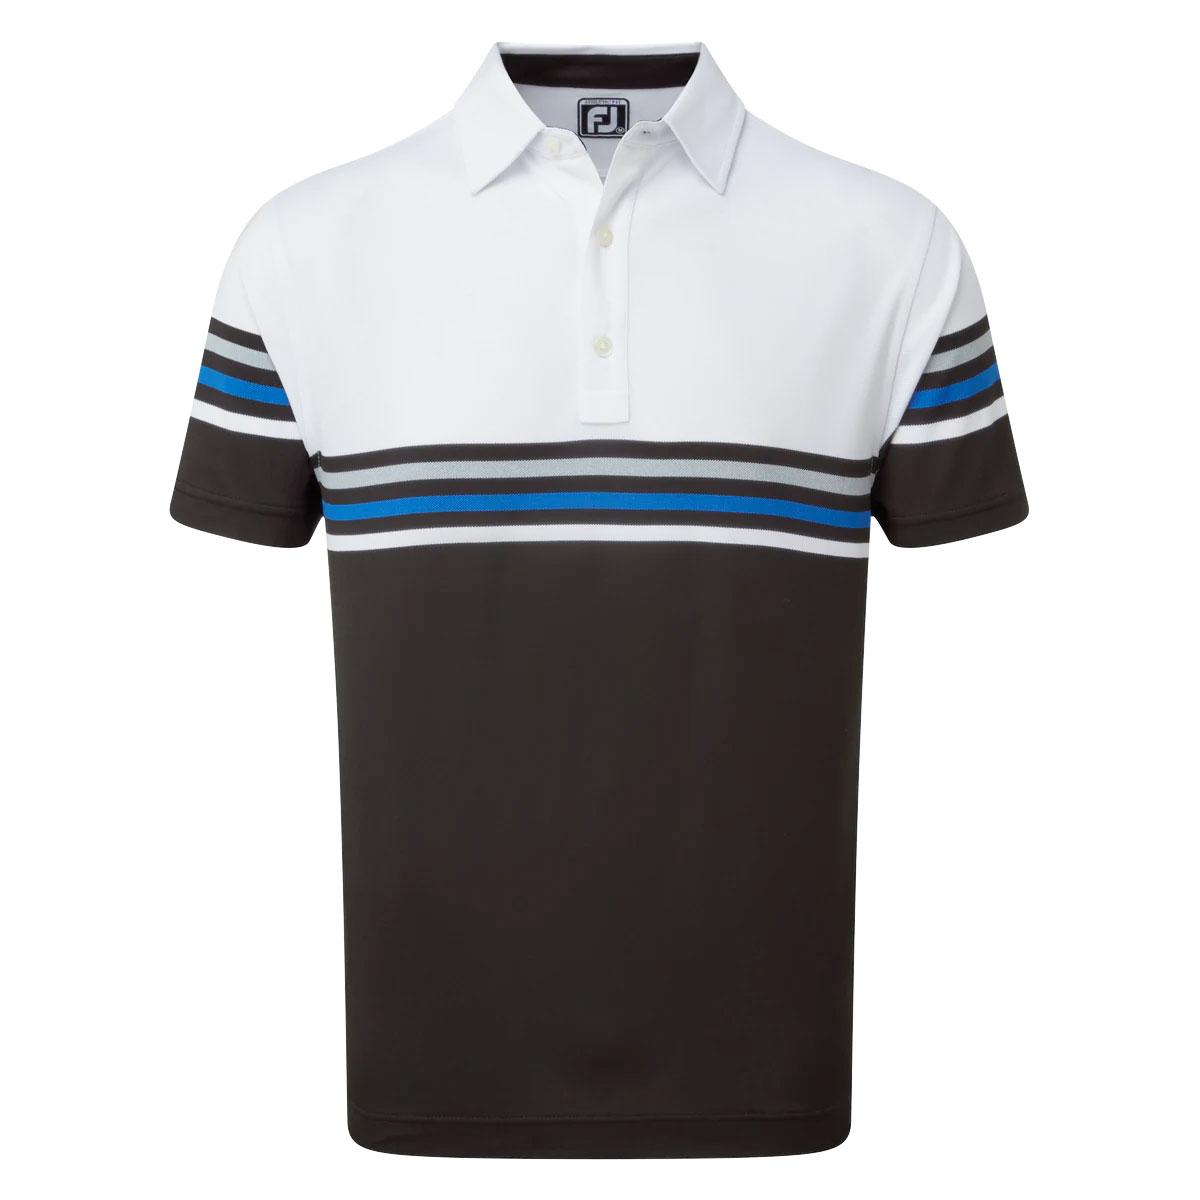 FootJoy Stretch Pique Colour Block Mens Golf Polo Shirt  - White/Black